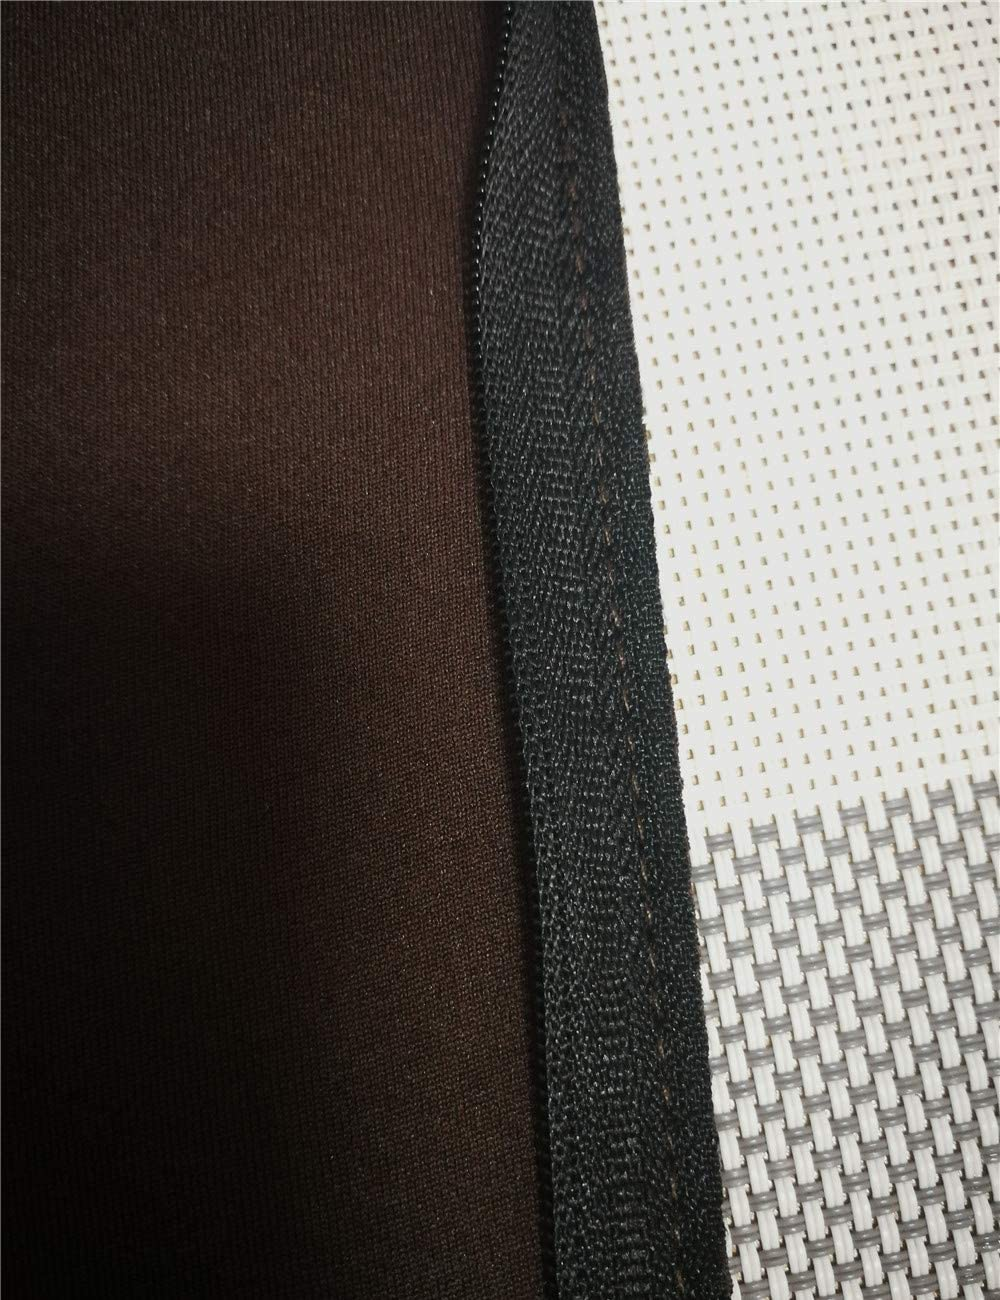 Ear Pads, Rose Gold M40X Foam Ear Pads Cushions for Audio Technica ATH M50X M40 M50 M30X Headphones